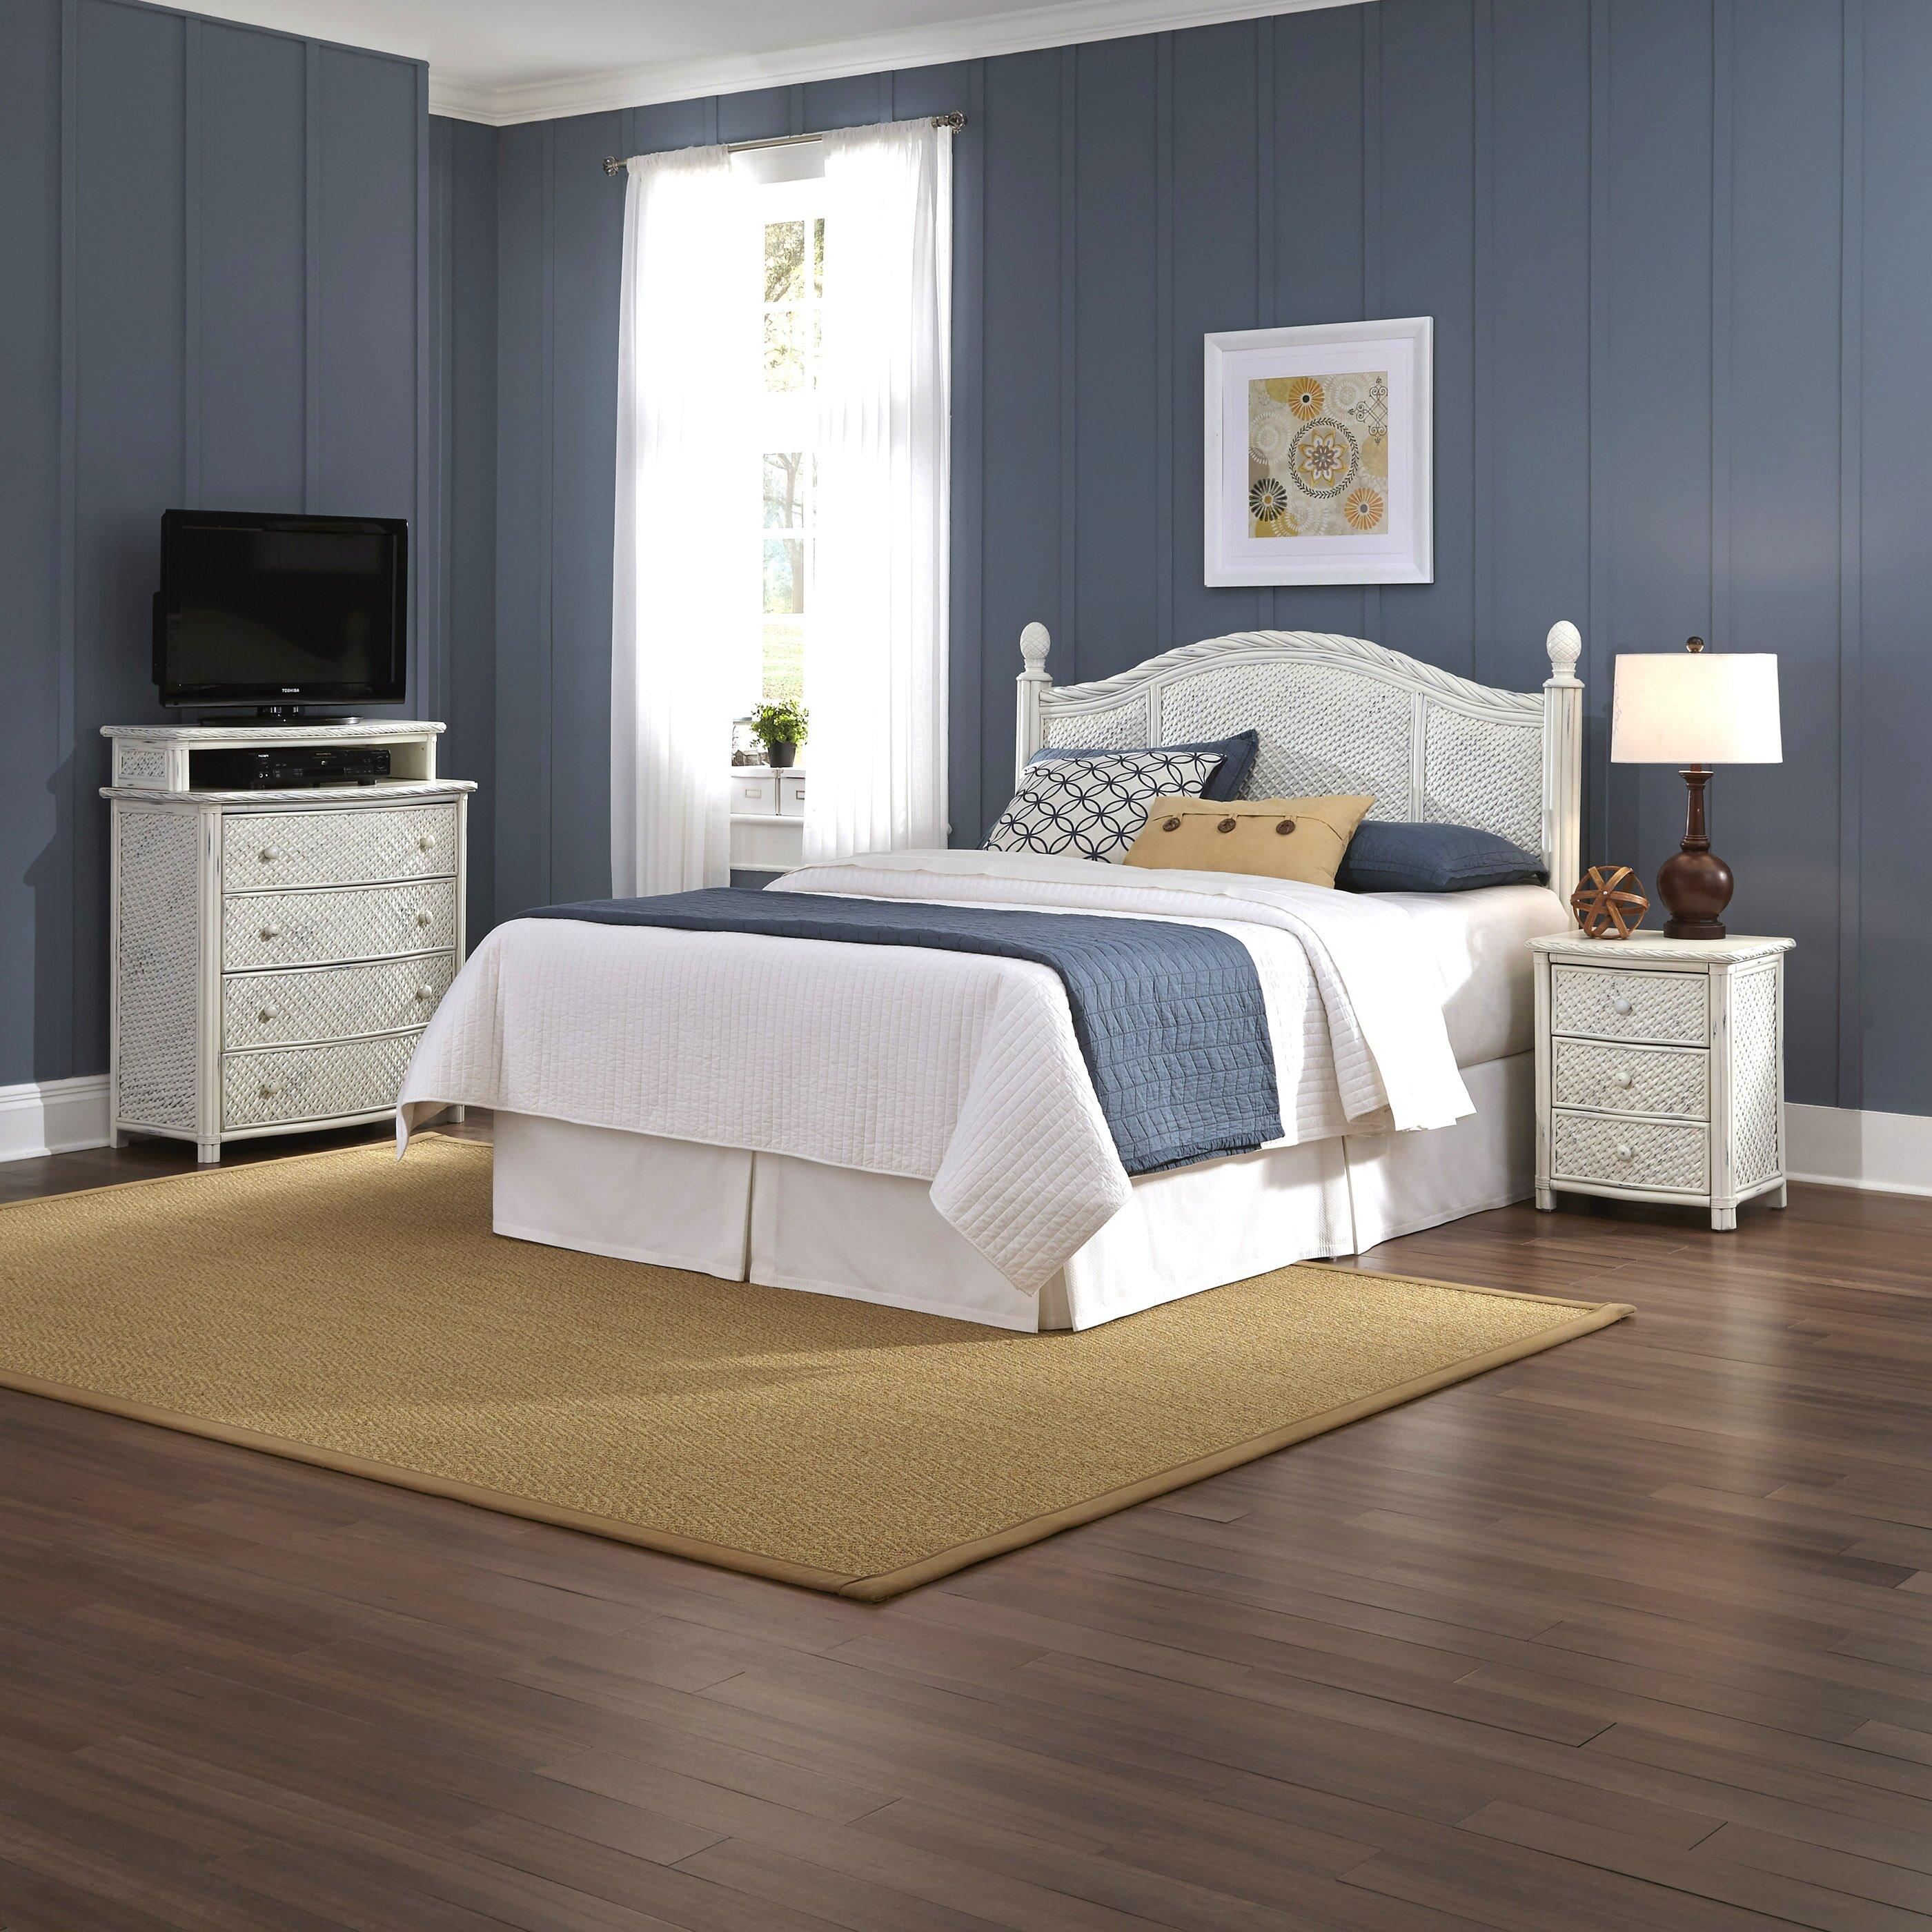 Bay Isle Home Oliver Platform 3 Piece Bedroom Set Reviews Wayfair